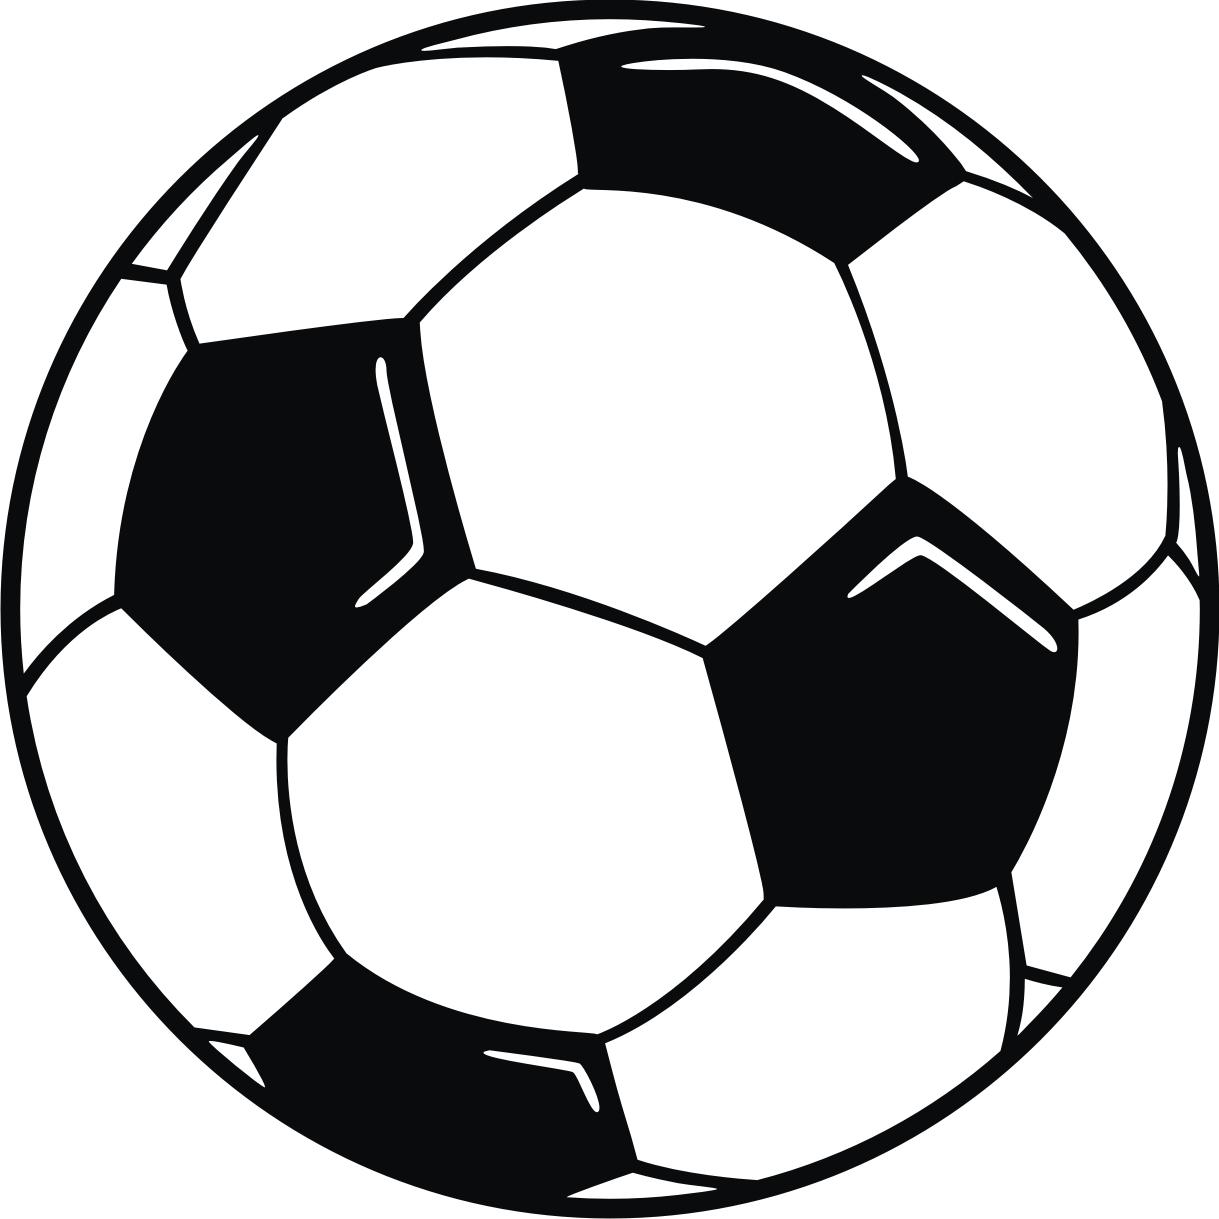 Clip Art: Soccer Ball